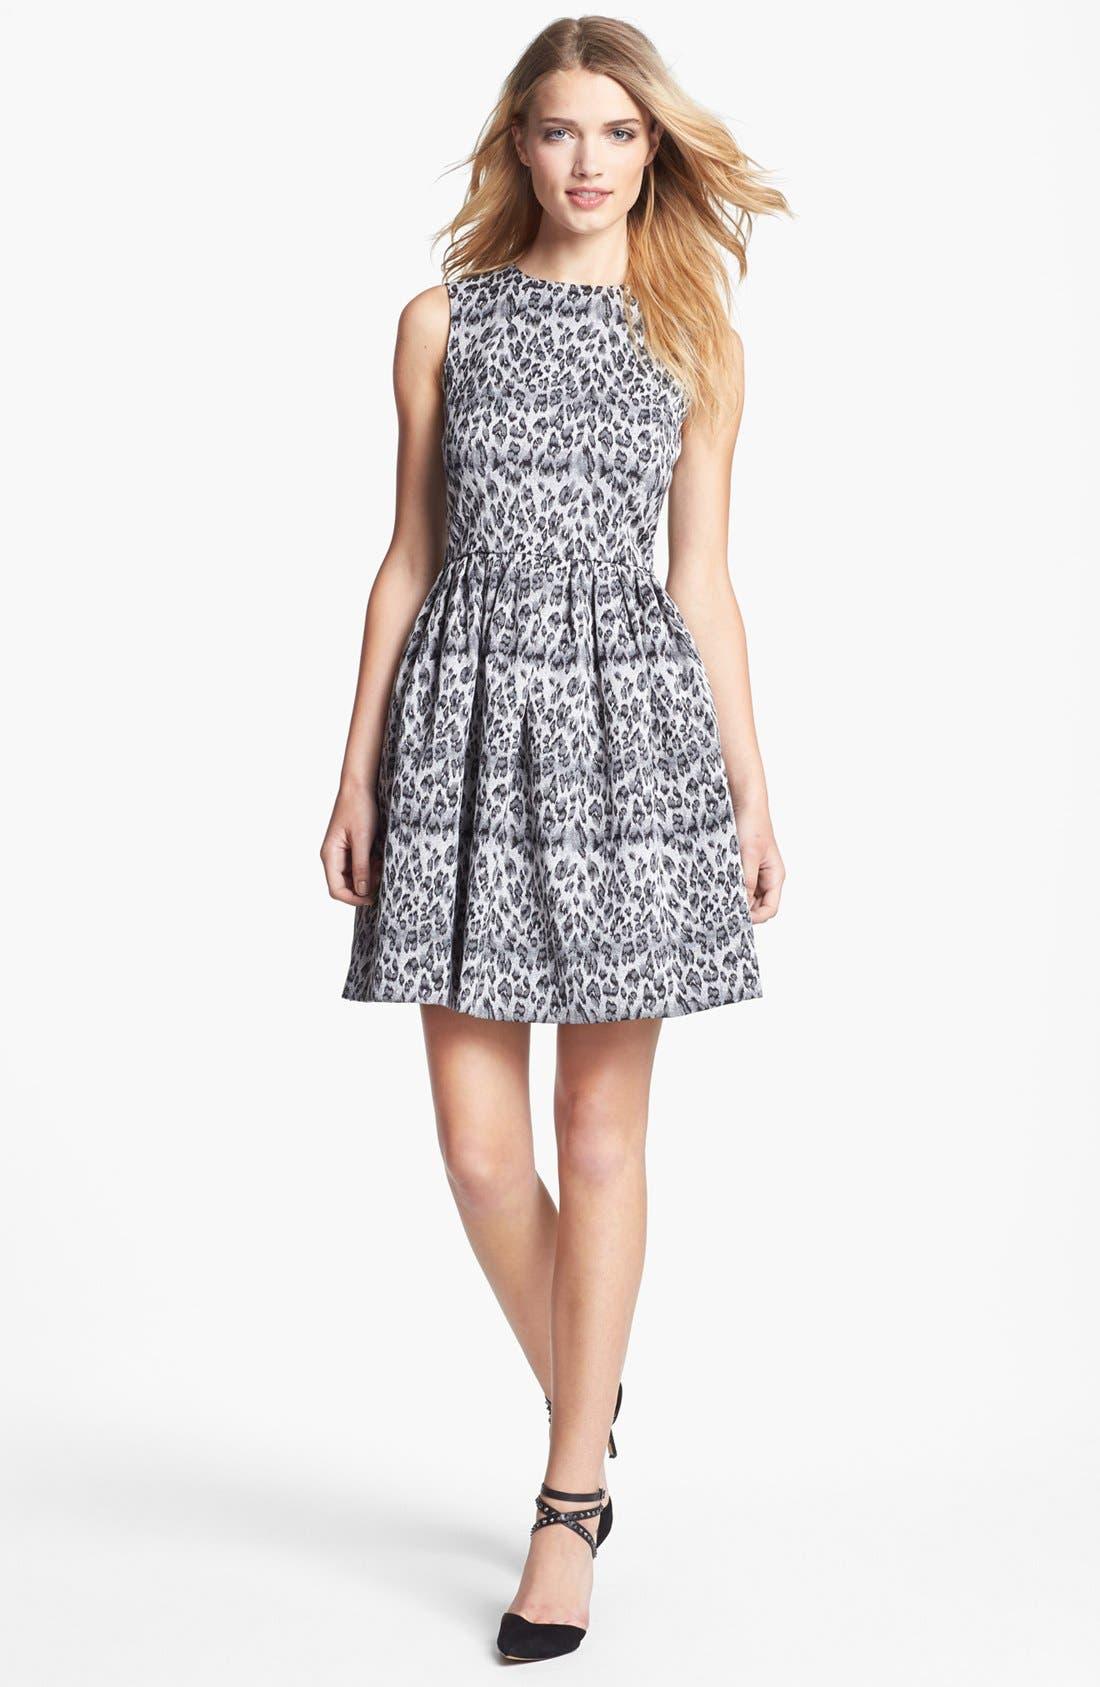 Main Image - Taylor Dresses Sleeveless Jacquard Fit & Flare Dress (Regular & Petite)